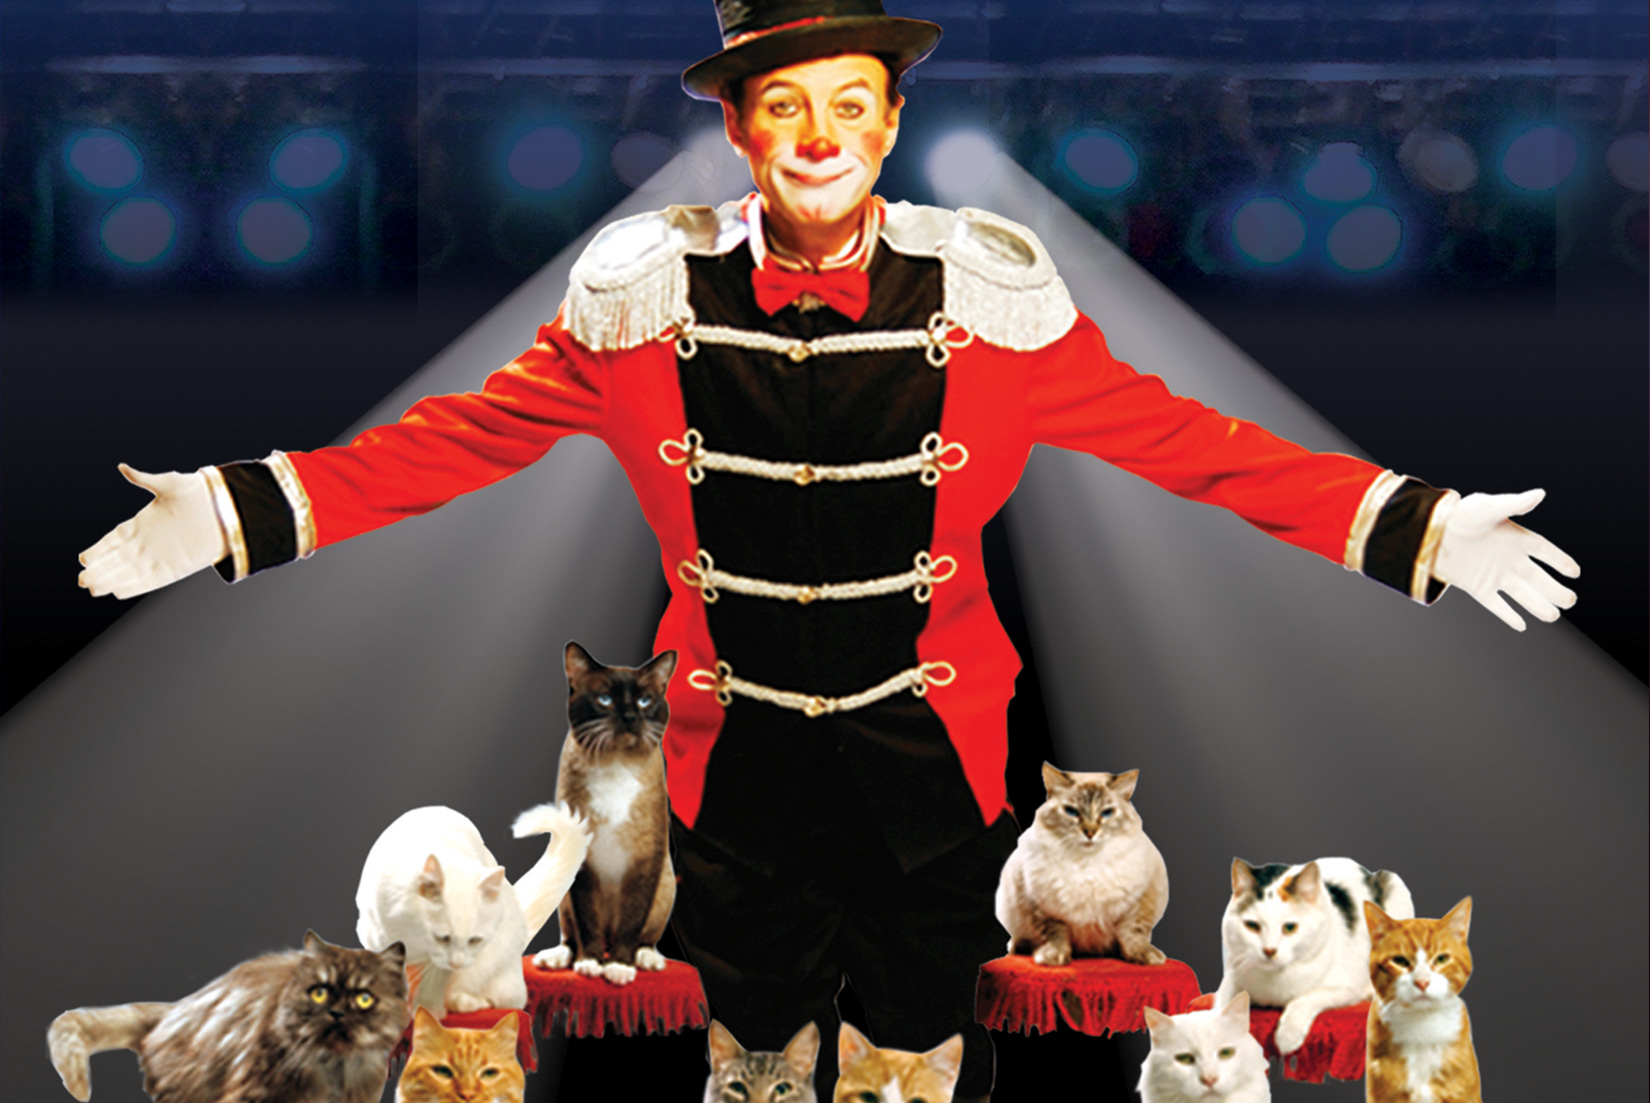 Popovich Comedy Pet Theater - SOLD OUT - Sheldon Theatre